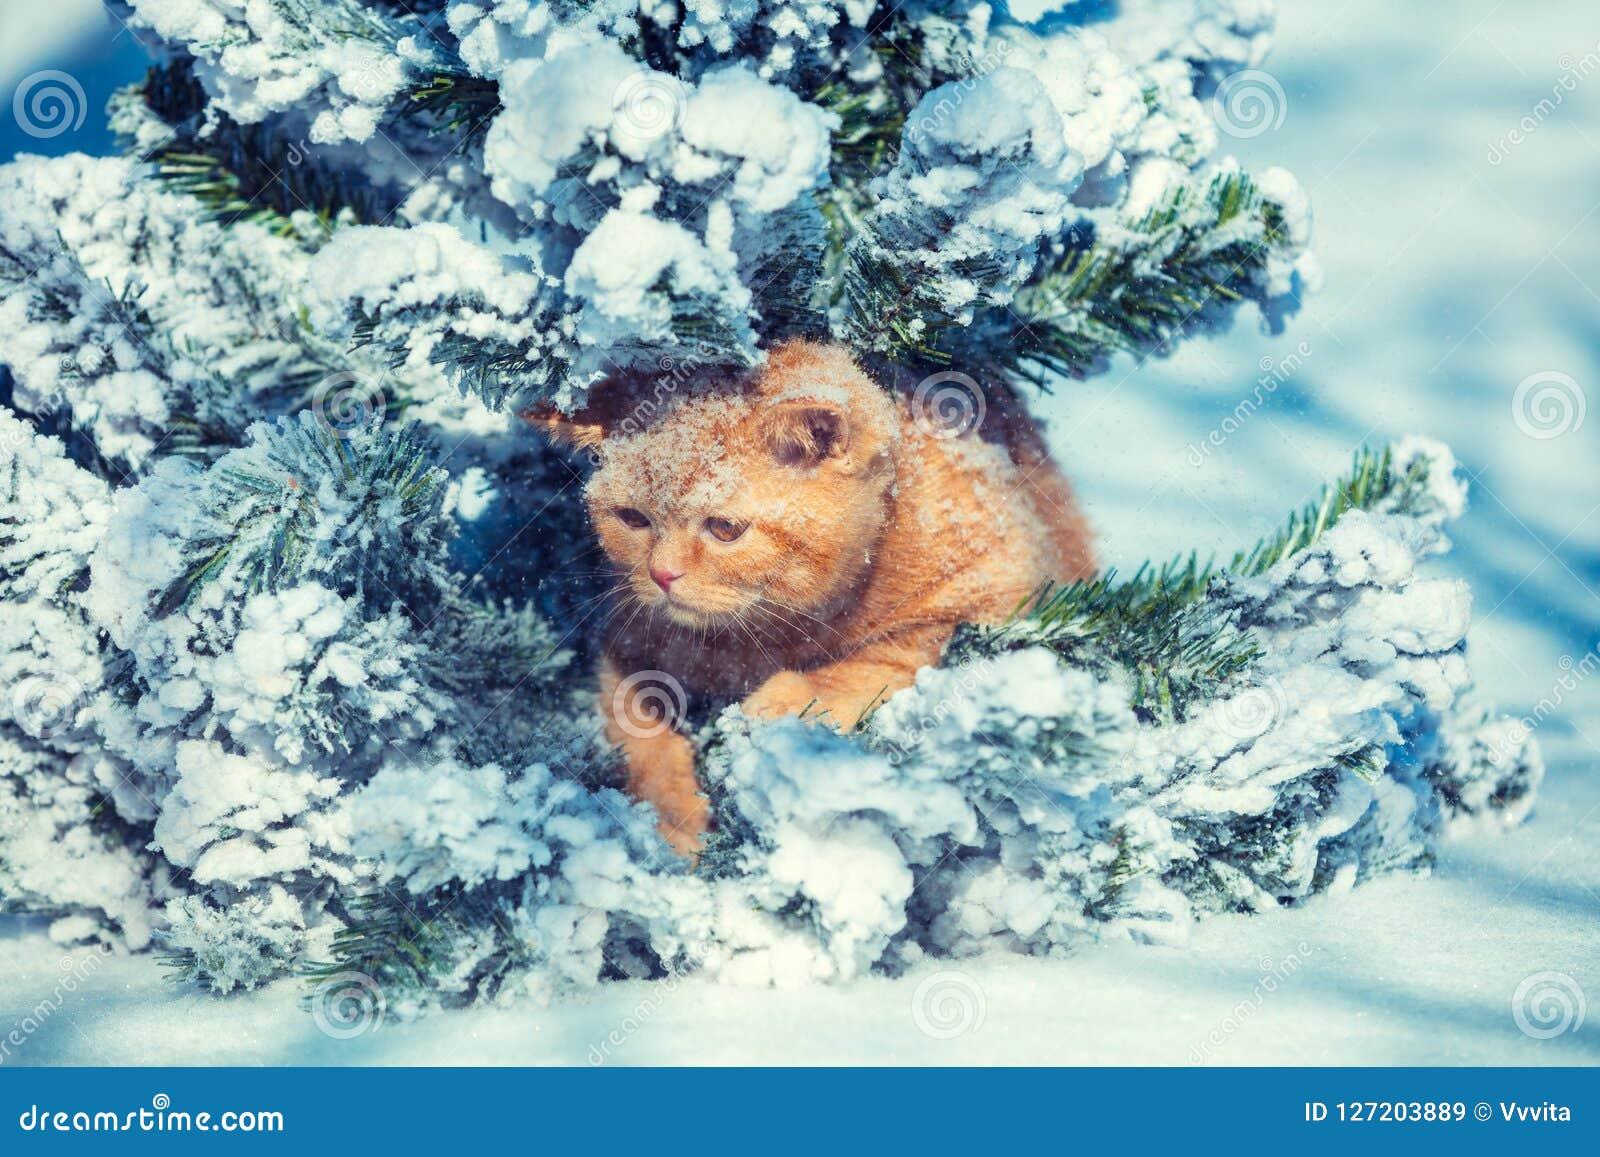 Cute ginger kitten sitting on the fir tree in winter